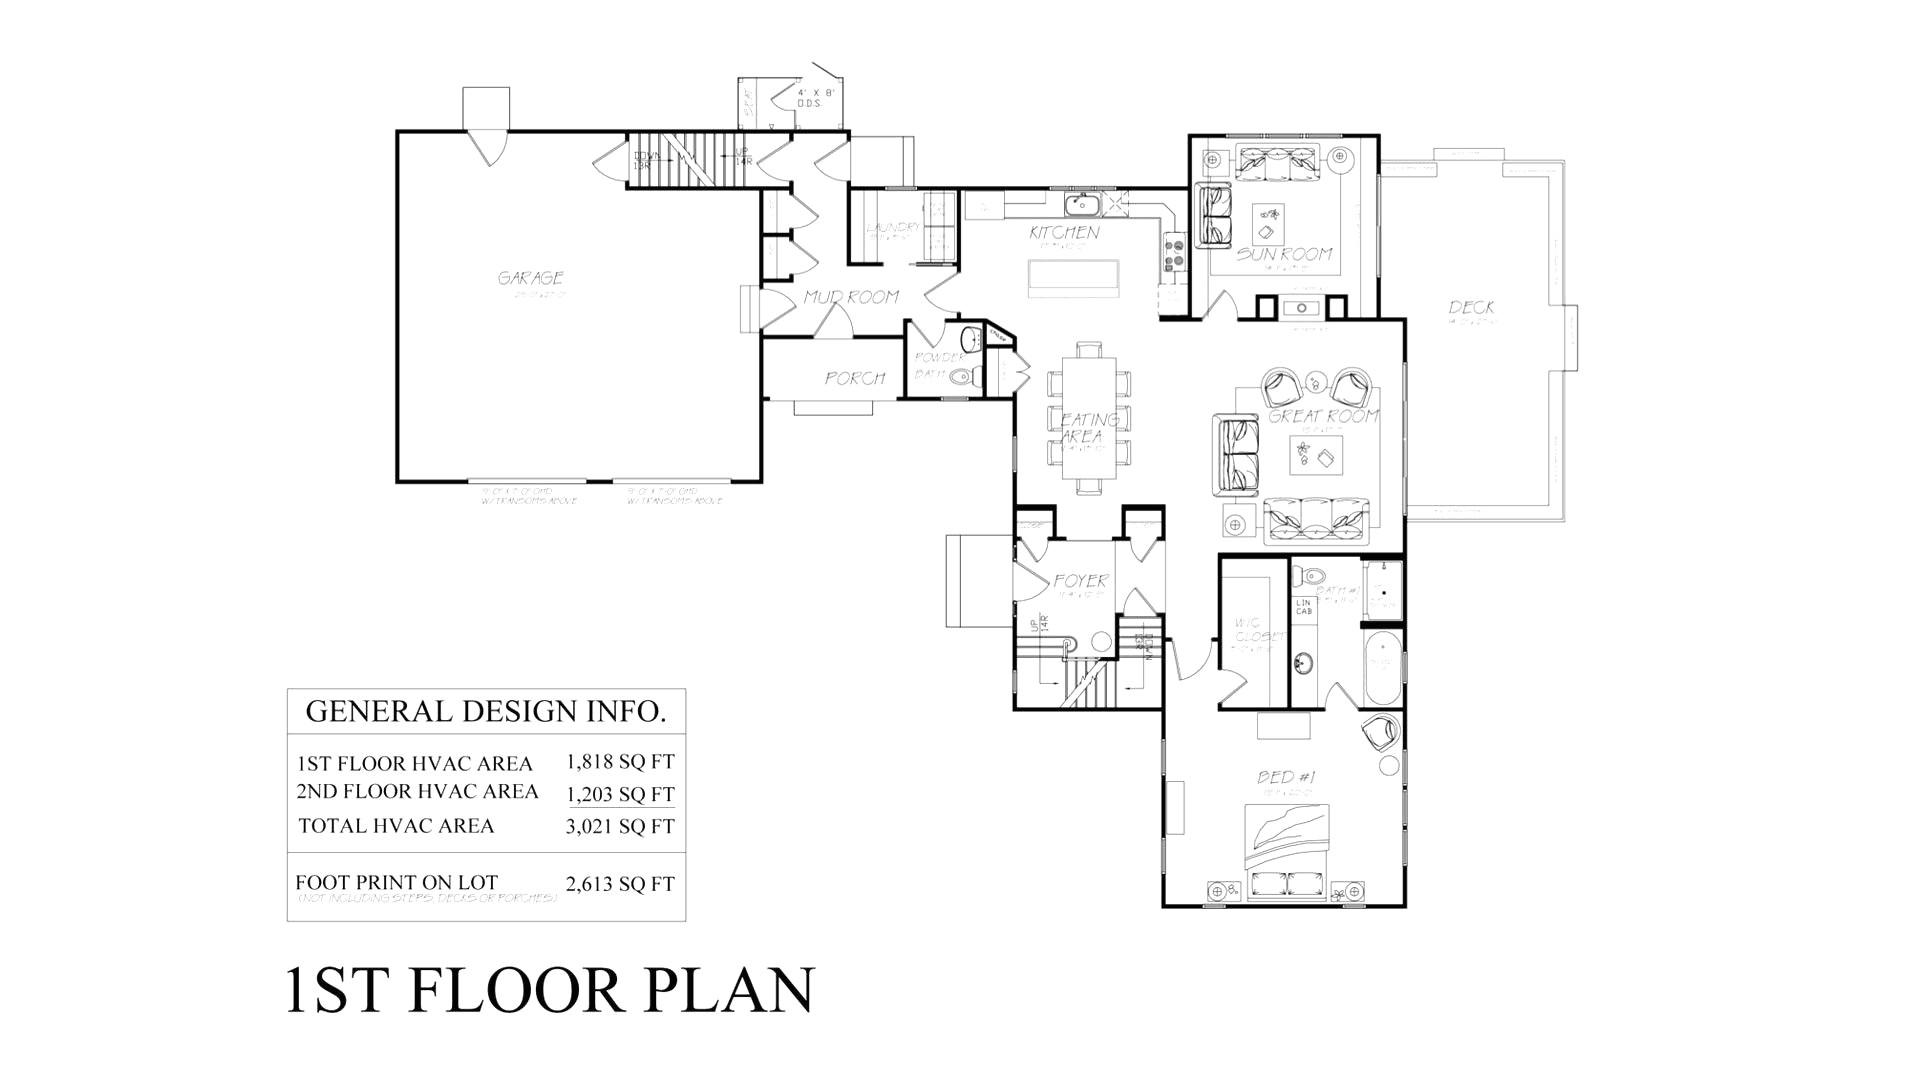 minecraft houses floor plans inspirational floor plan unique home plans 0d download by size handphone of minecraft houses floor plans jpg